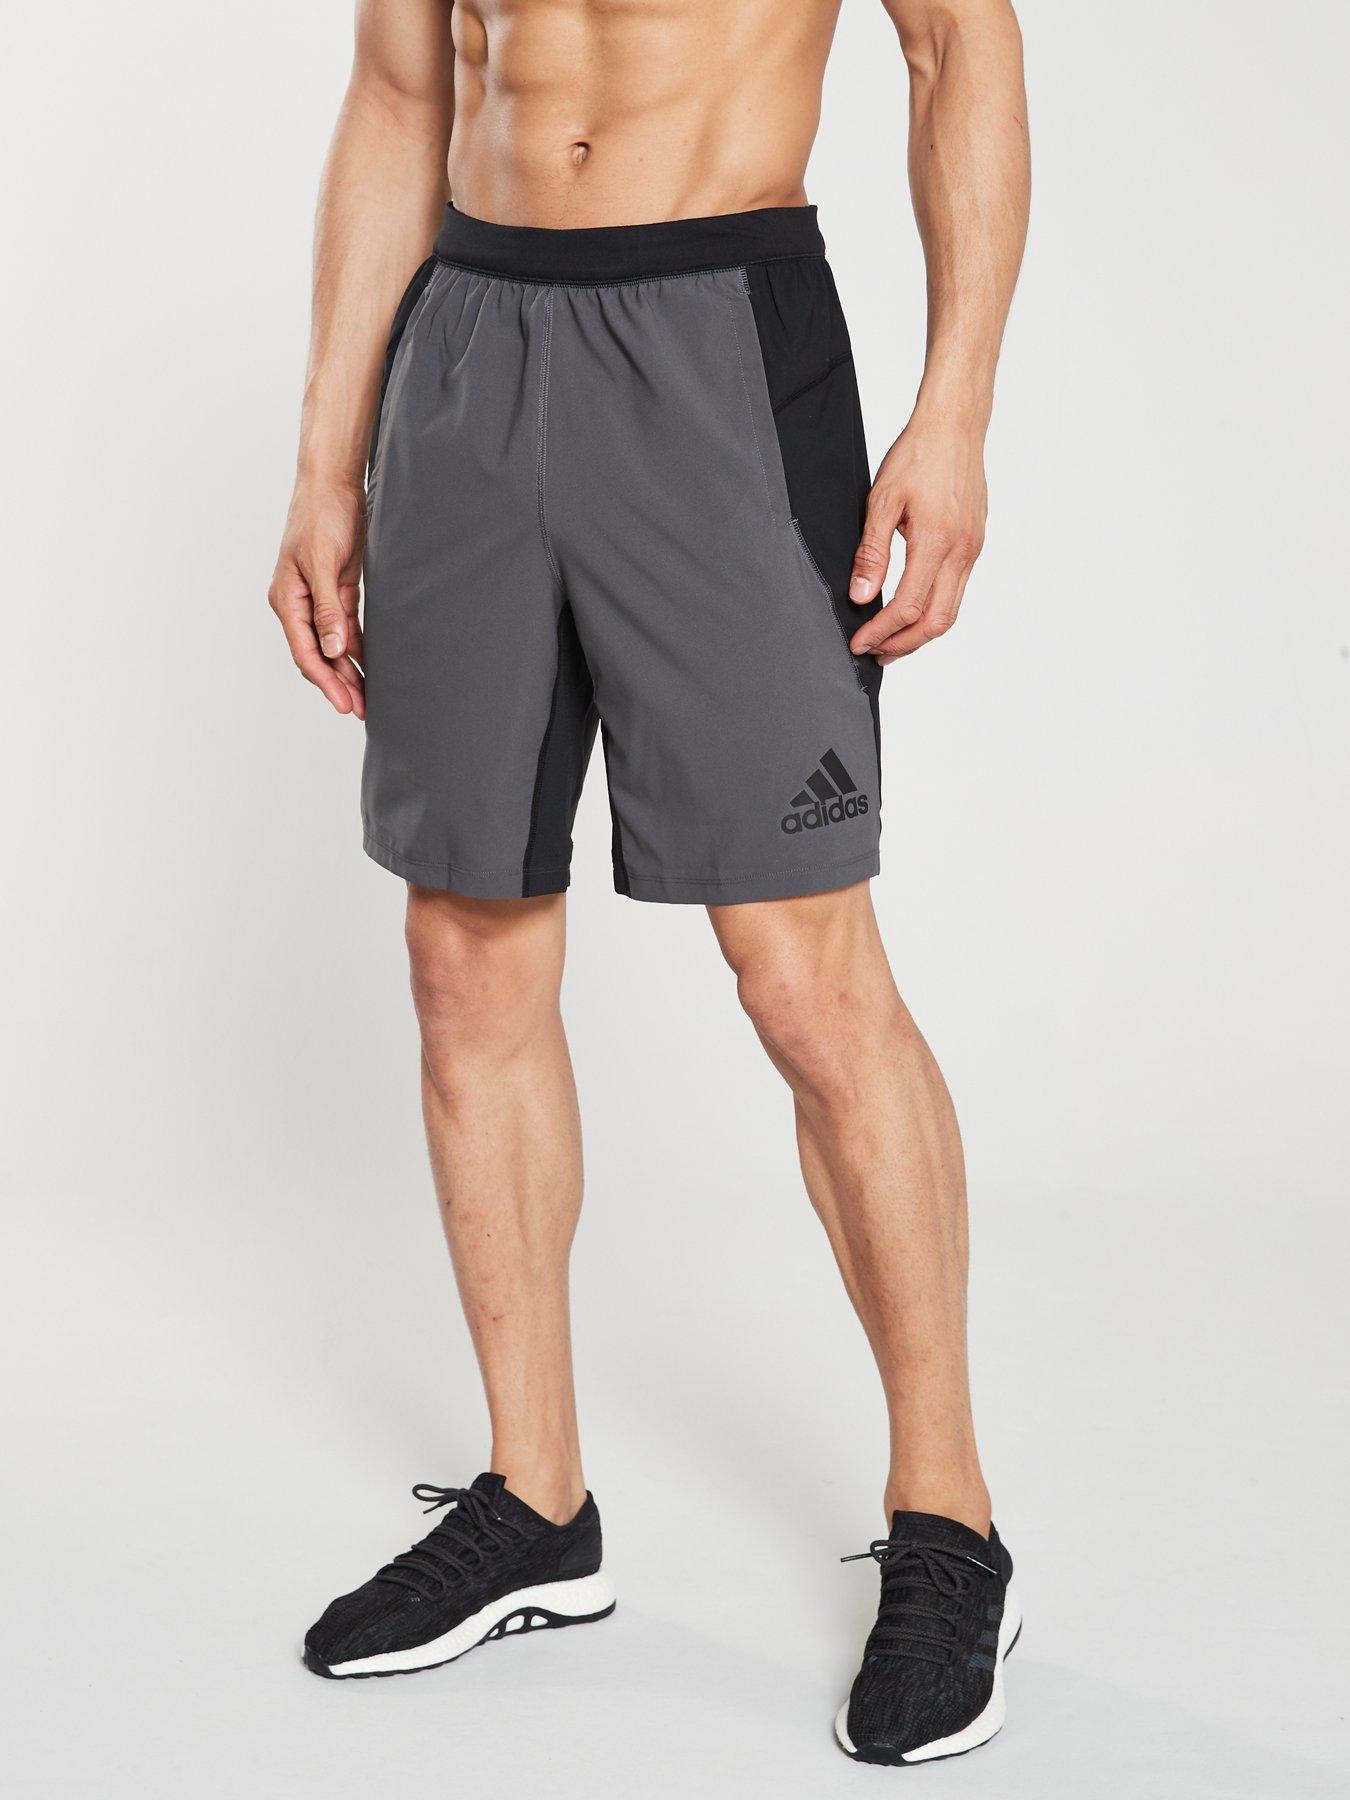 Adidas   Shorts   Mens sports clothing   Sports & leisure